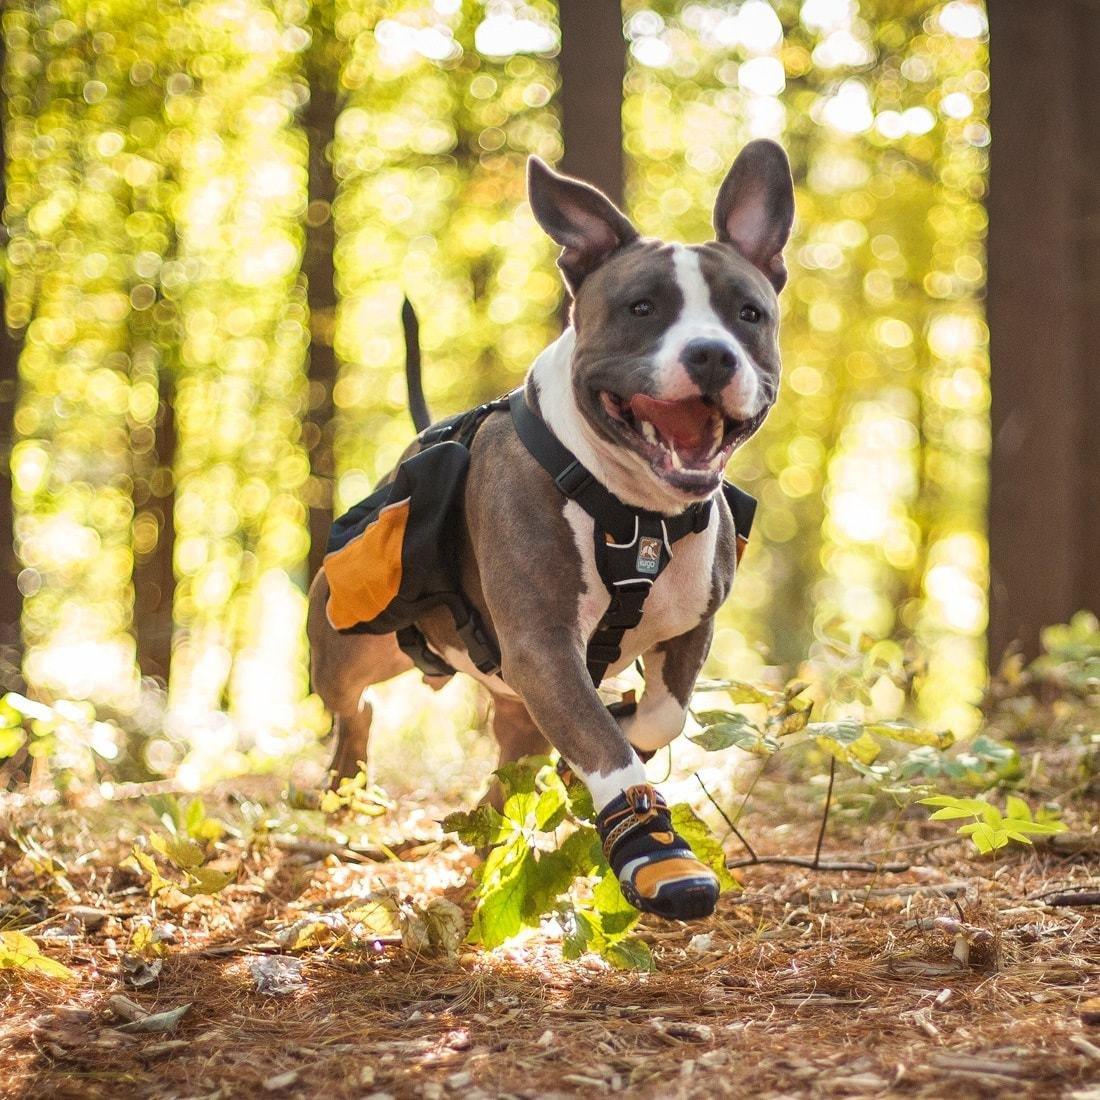 Kurgo dog camping hịking boots